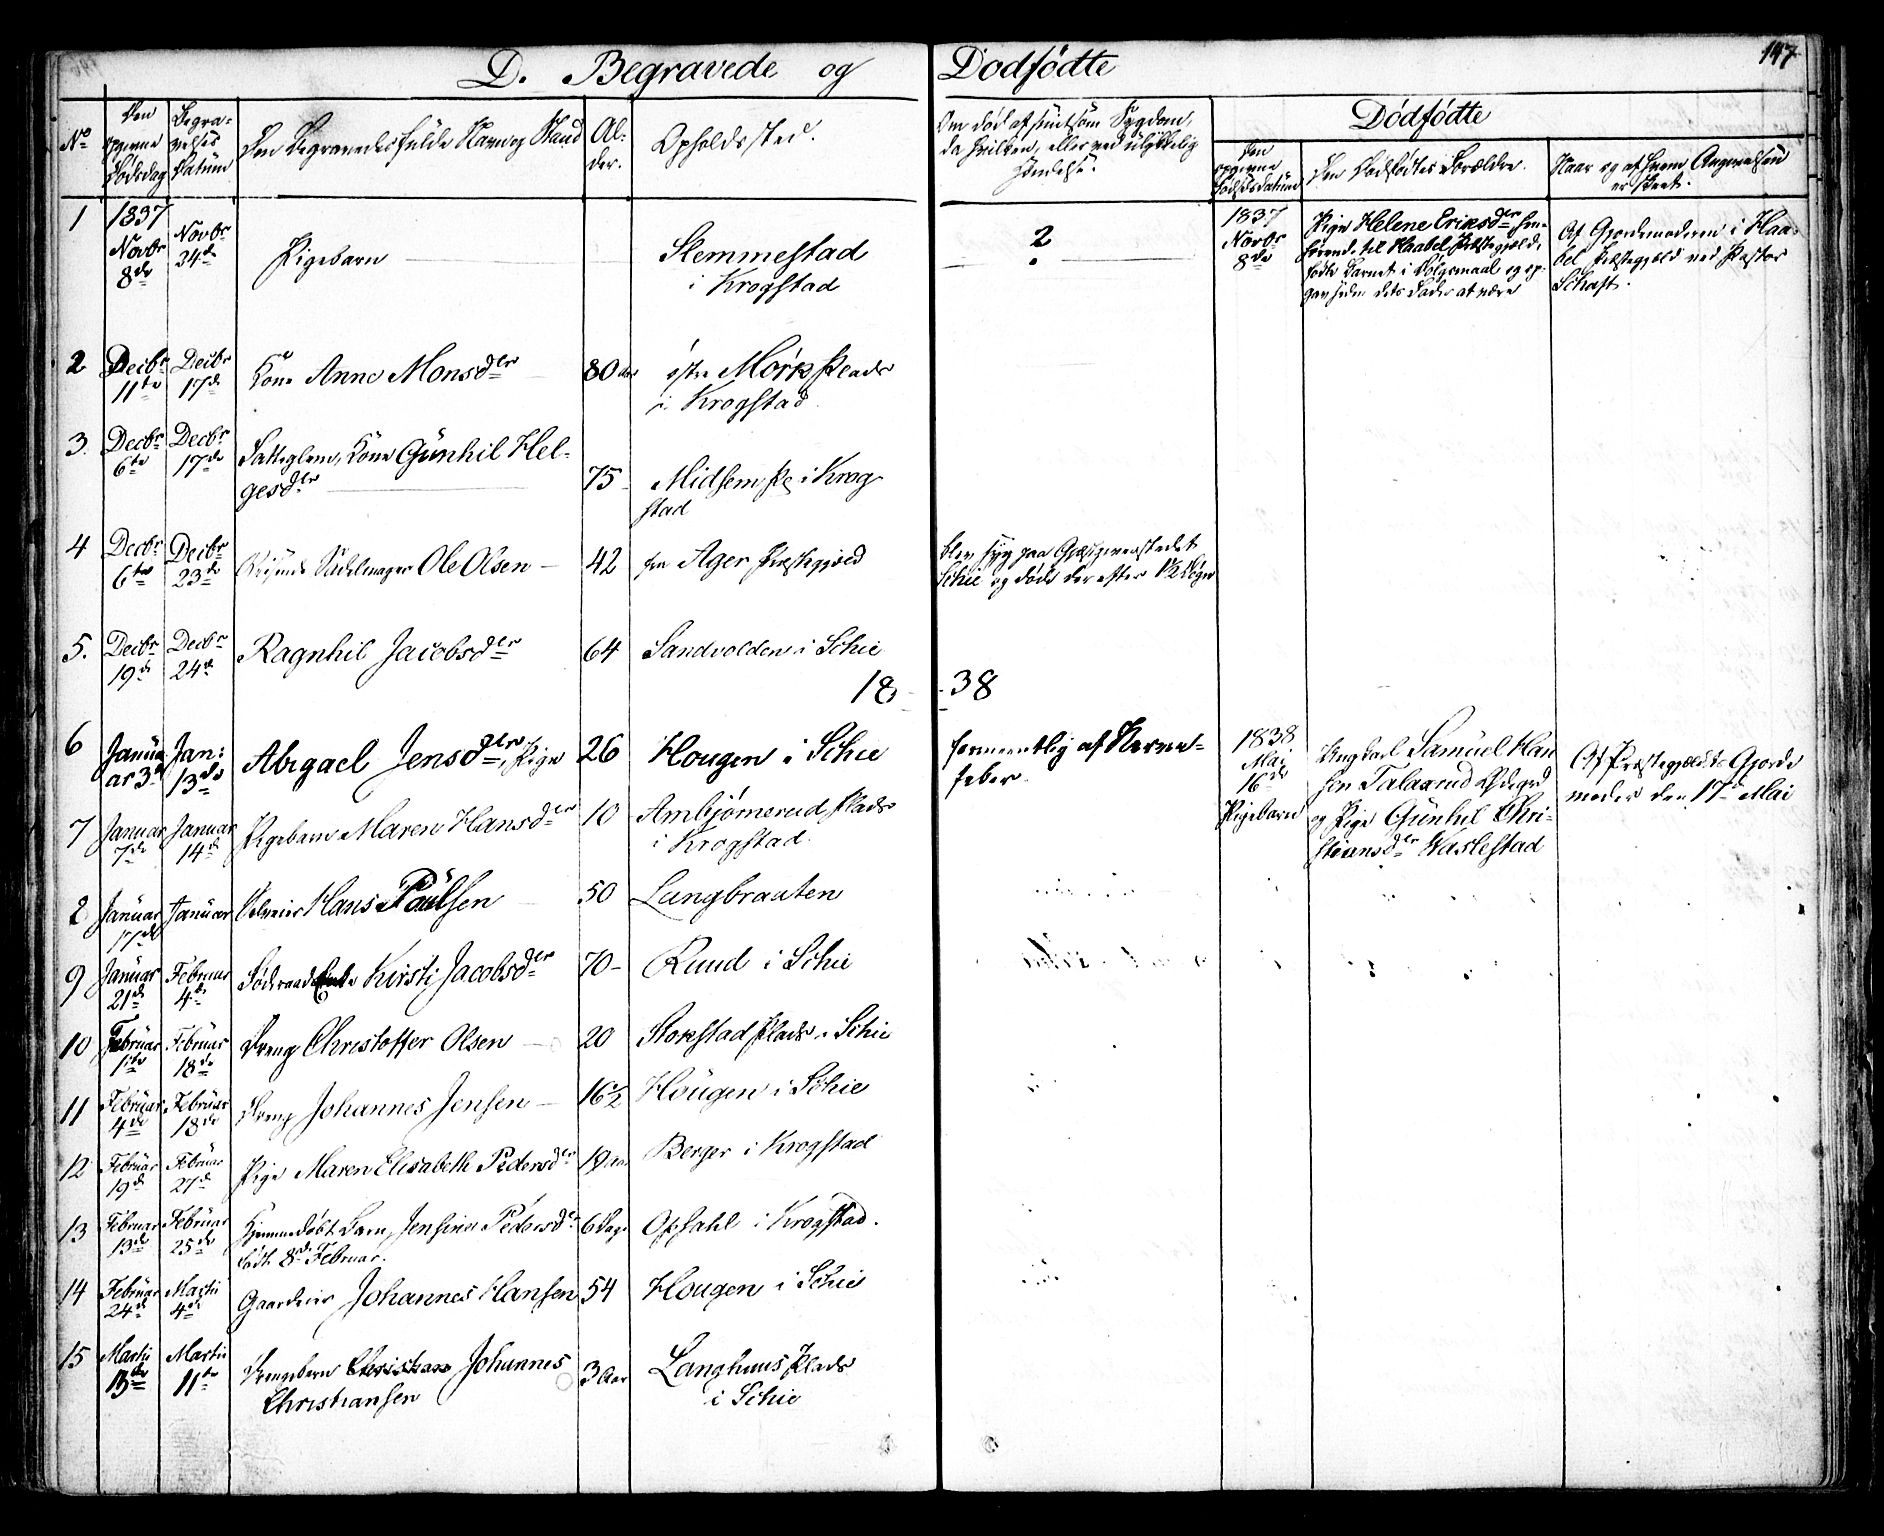 SAO, Kråkstad prestekontor Kirkebøker, F/Fa/L0005: Parish register (official) no. I 5, 1837-1847, p. 147